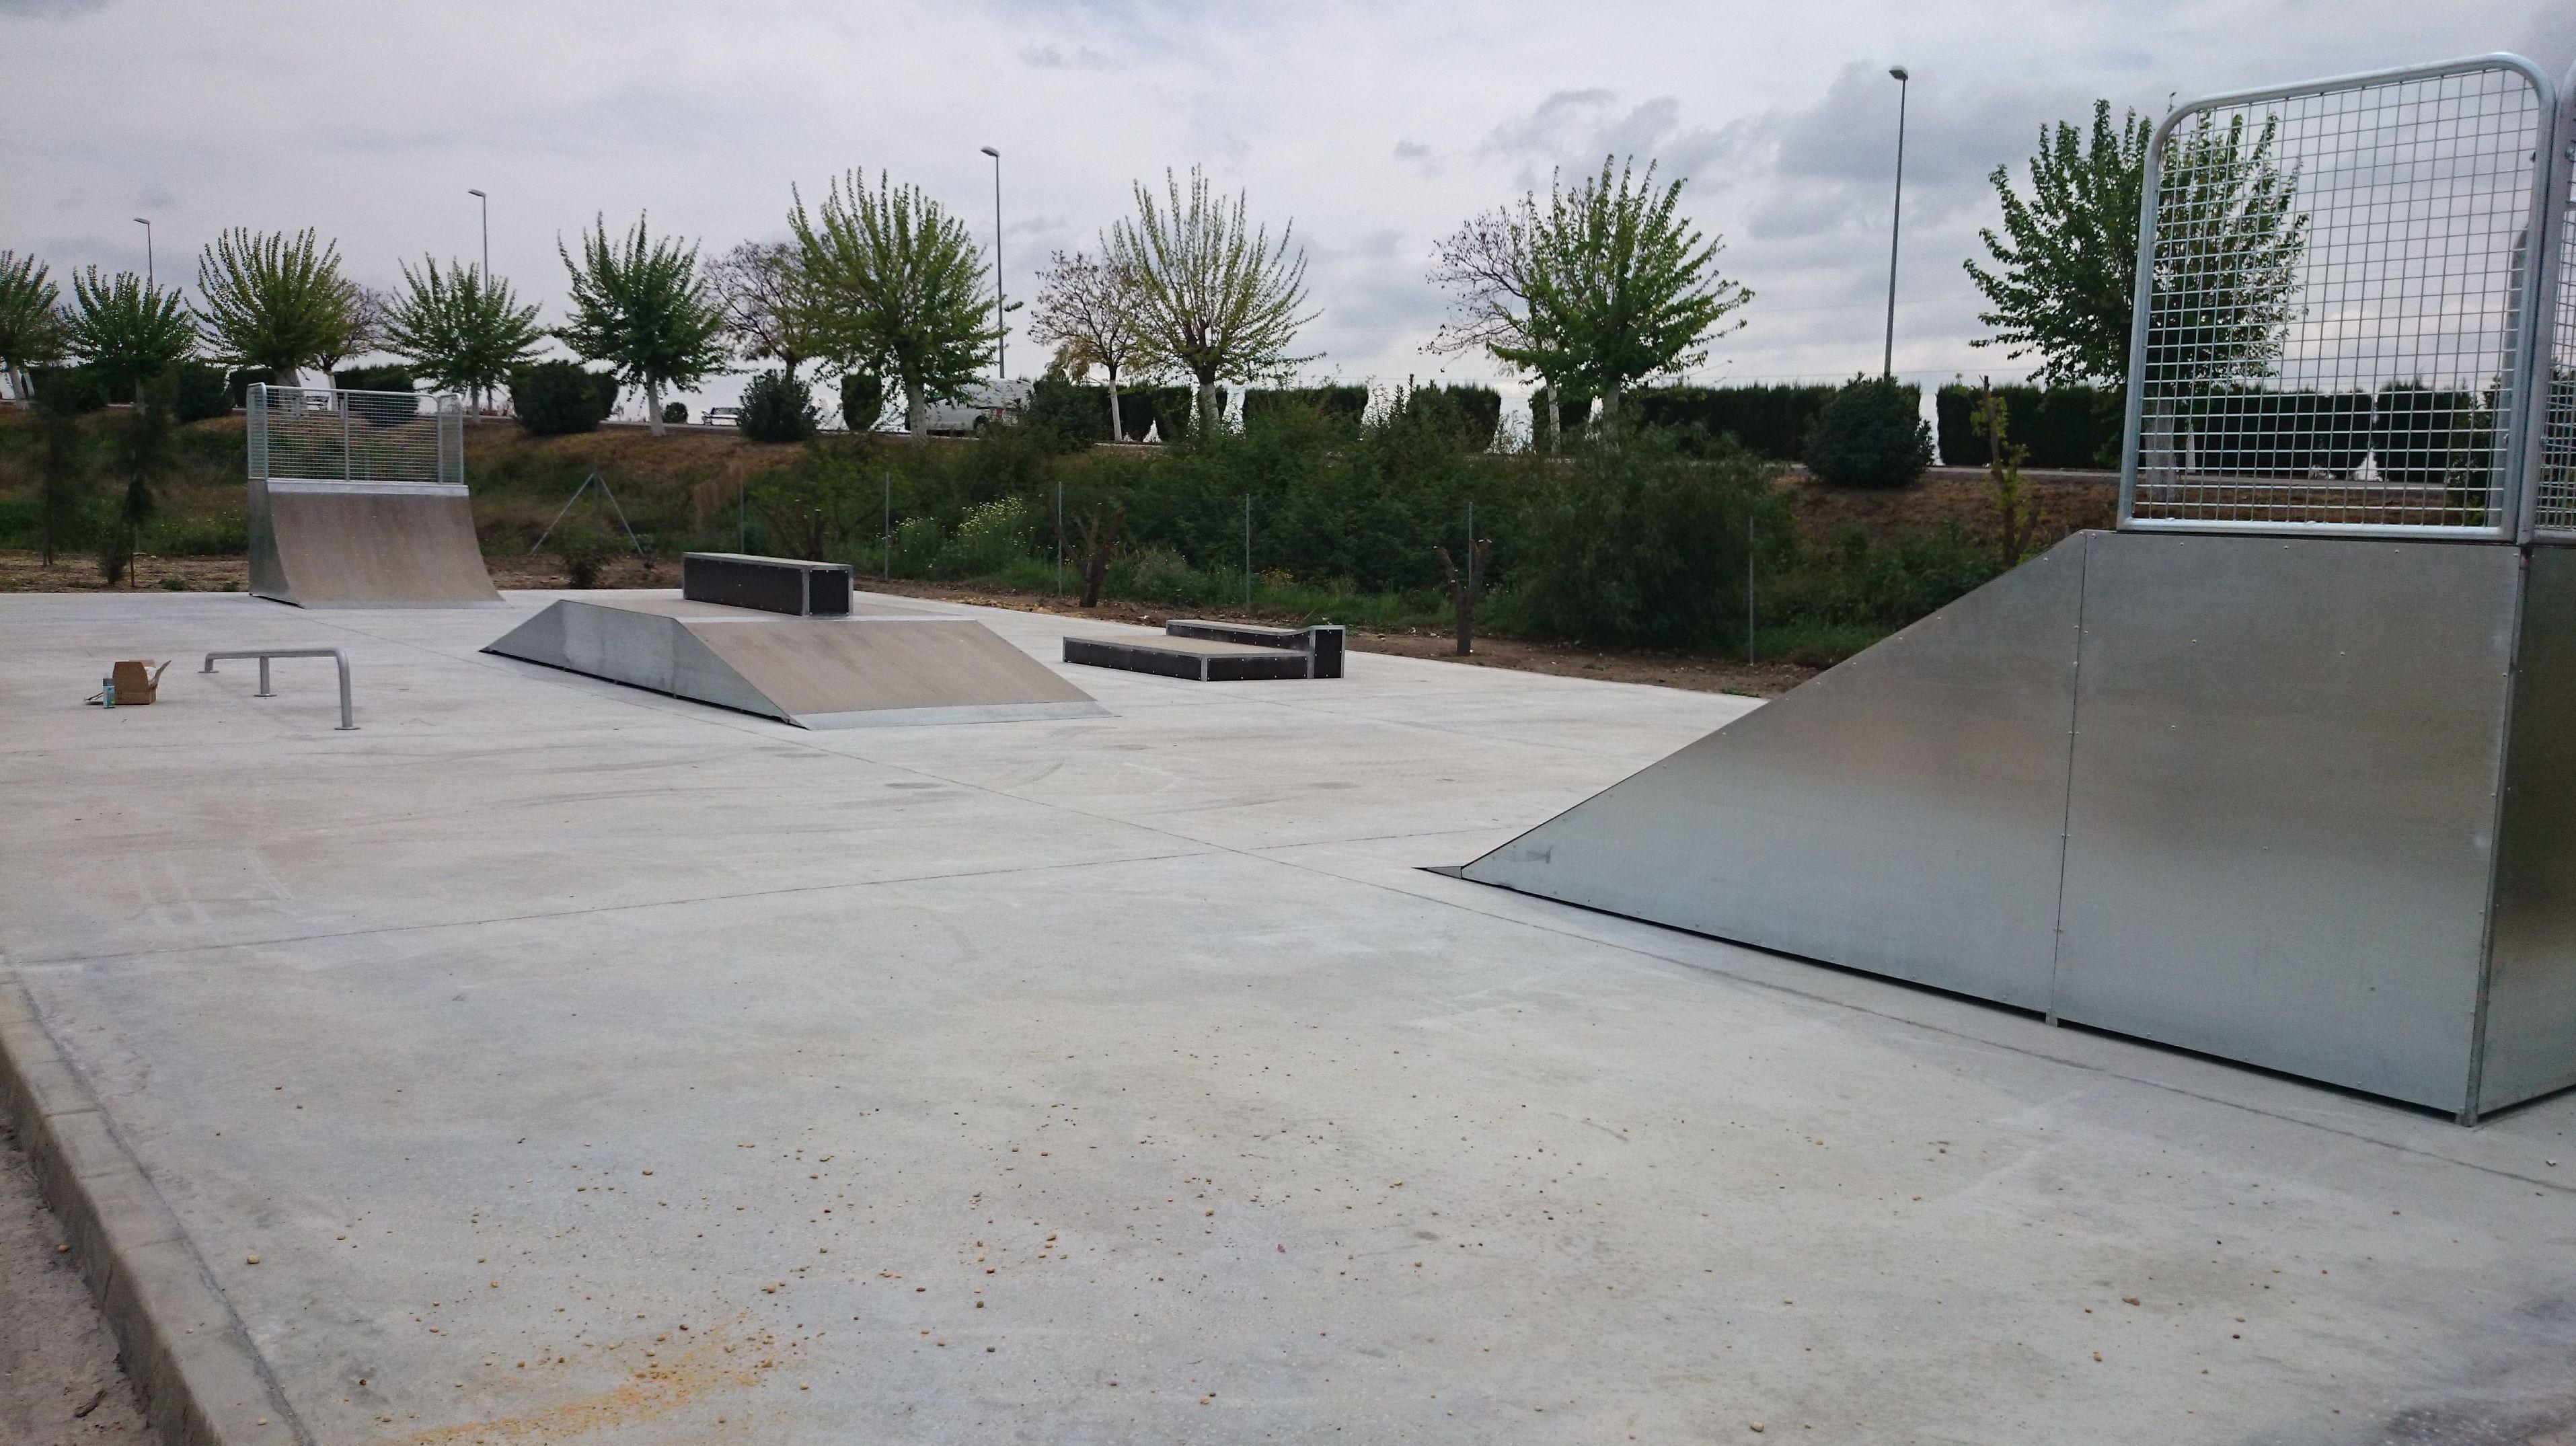 Foto 1 de Skate en Amorebieta | Transformers Skateparks